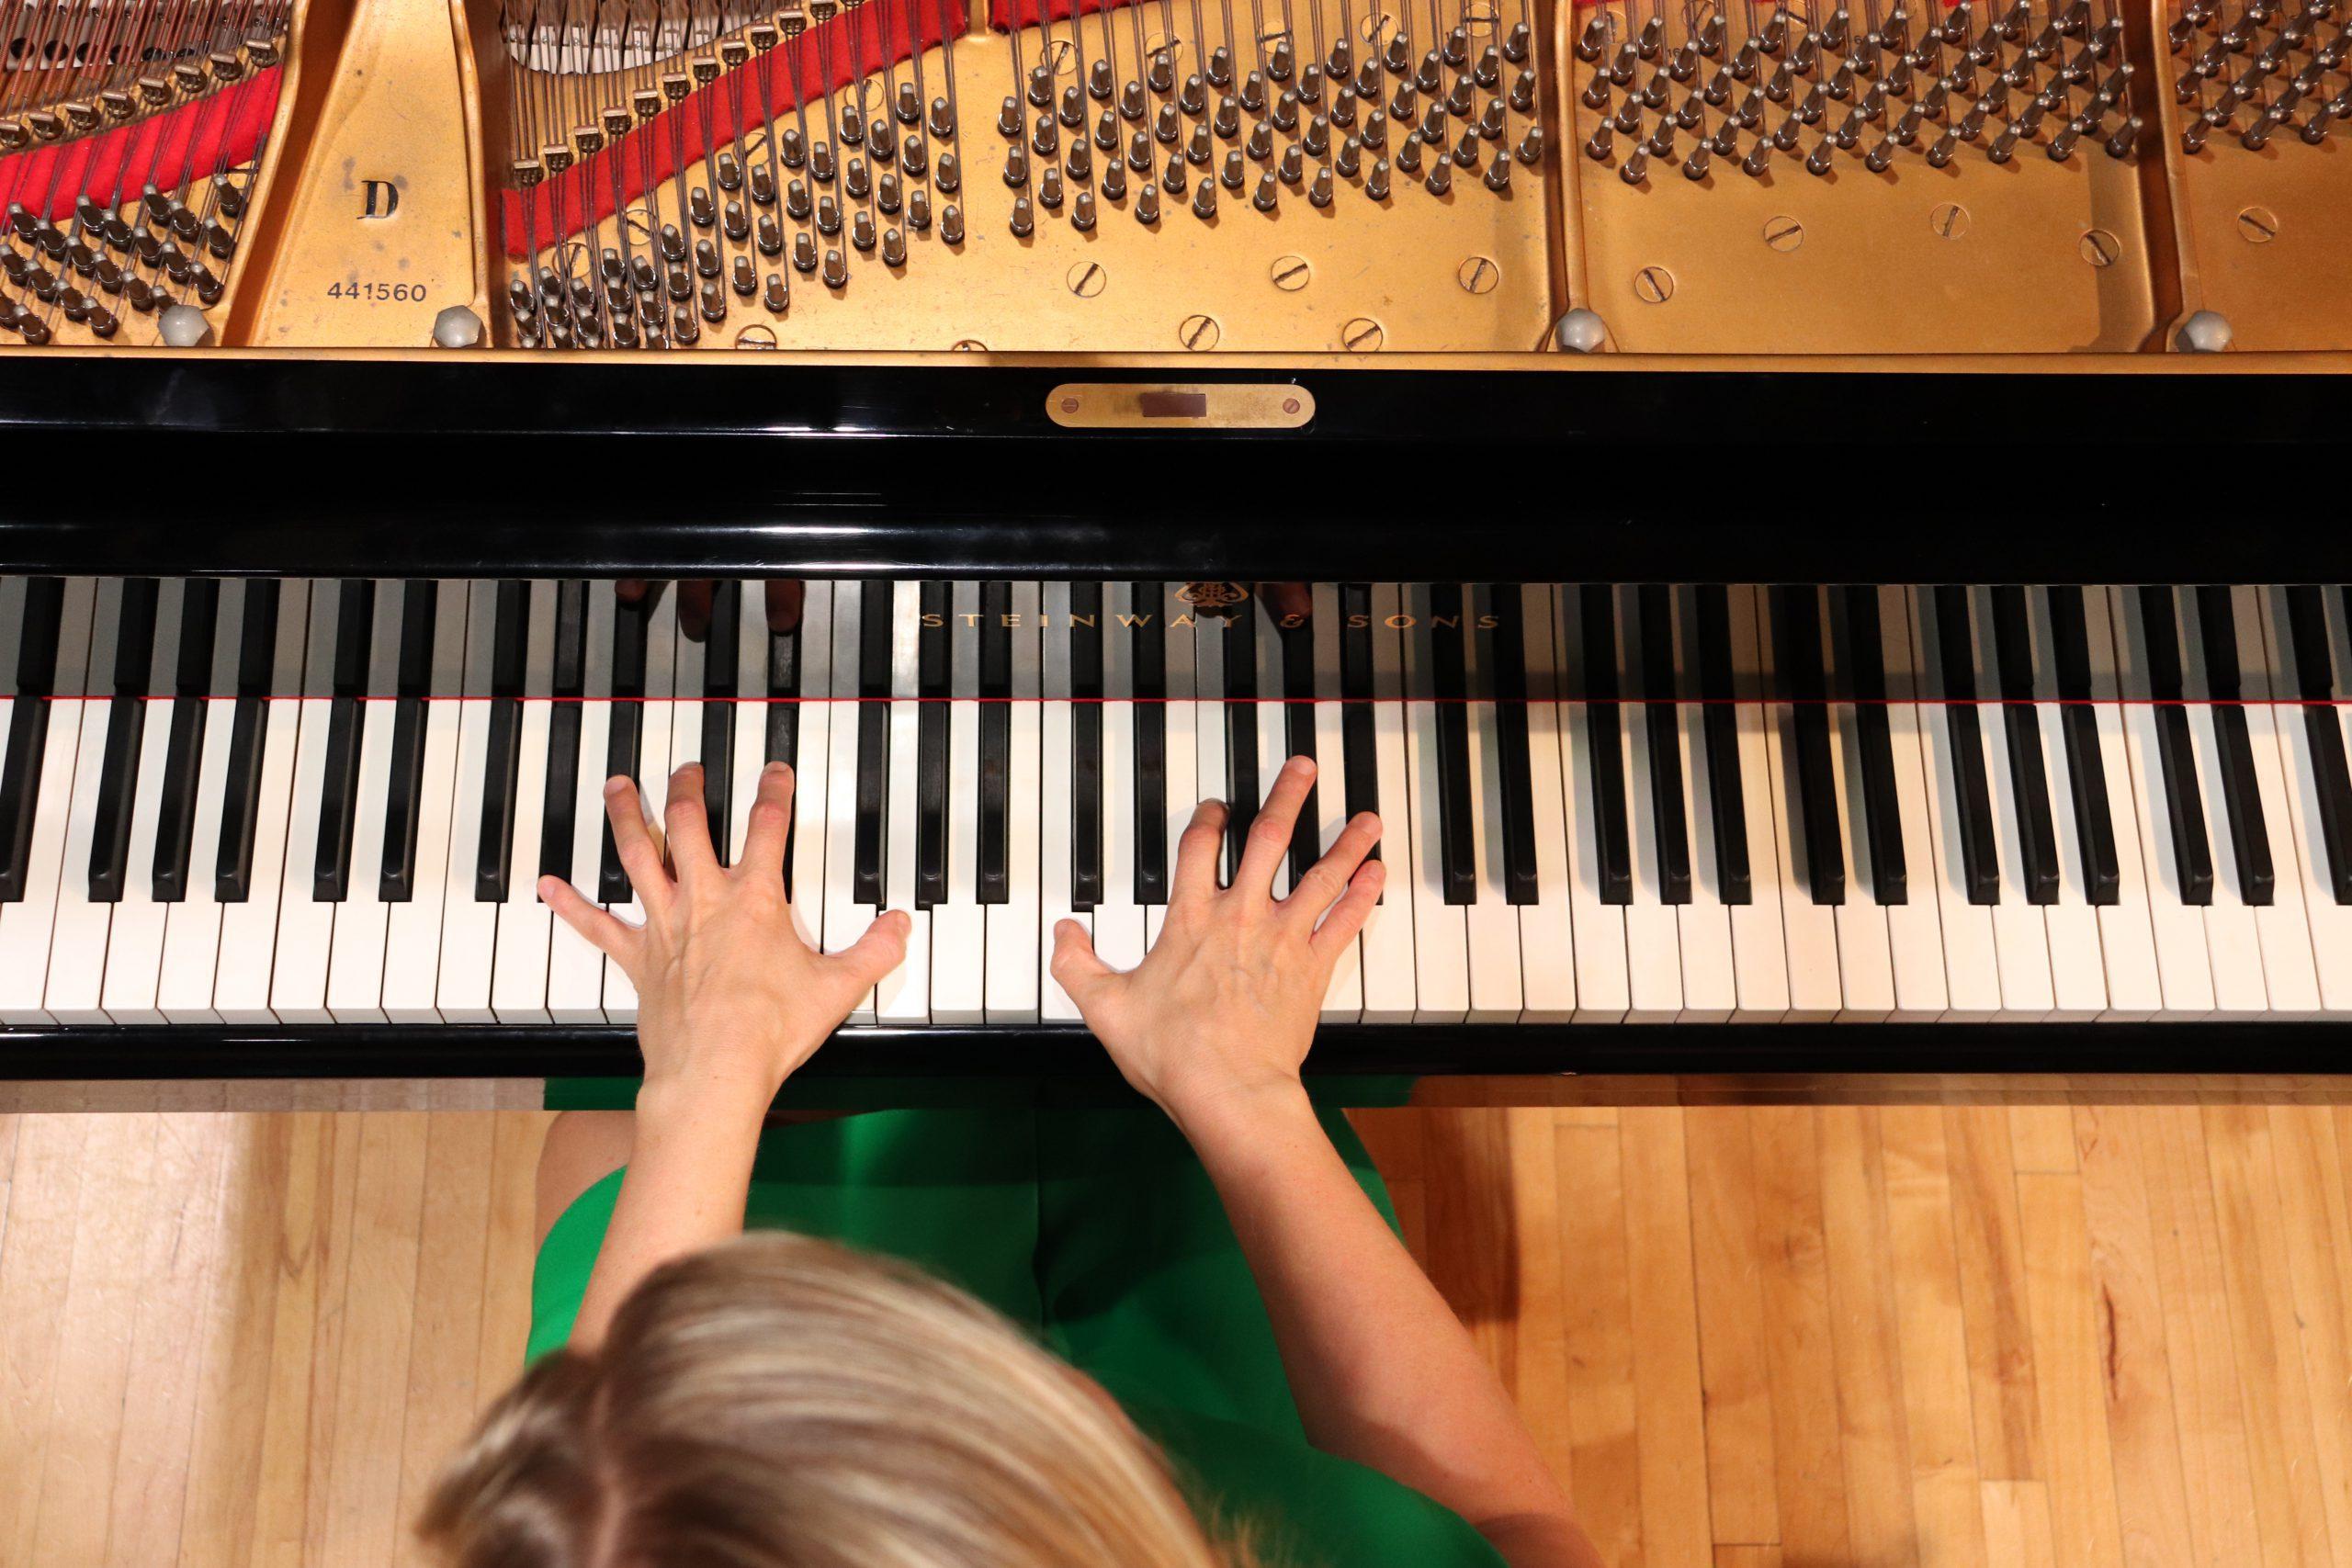 Brenda playing the piano